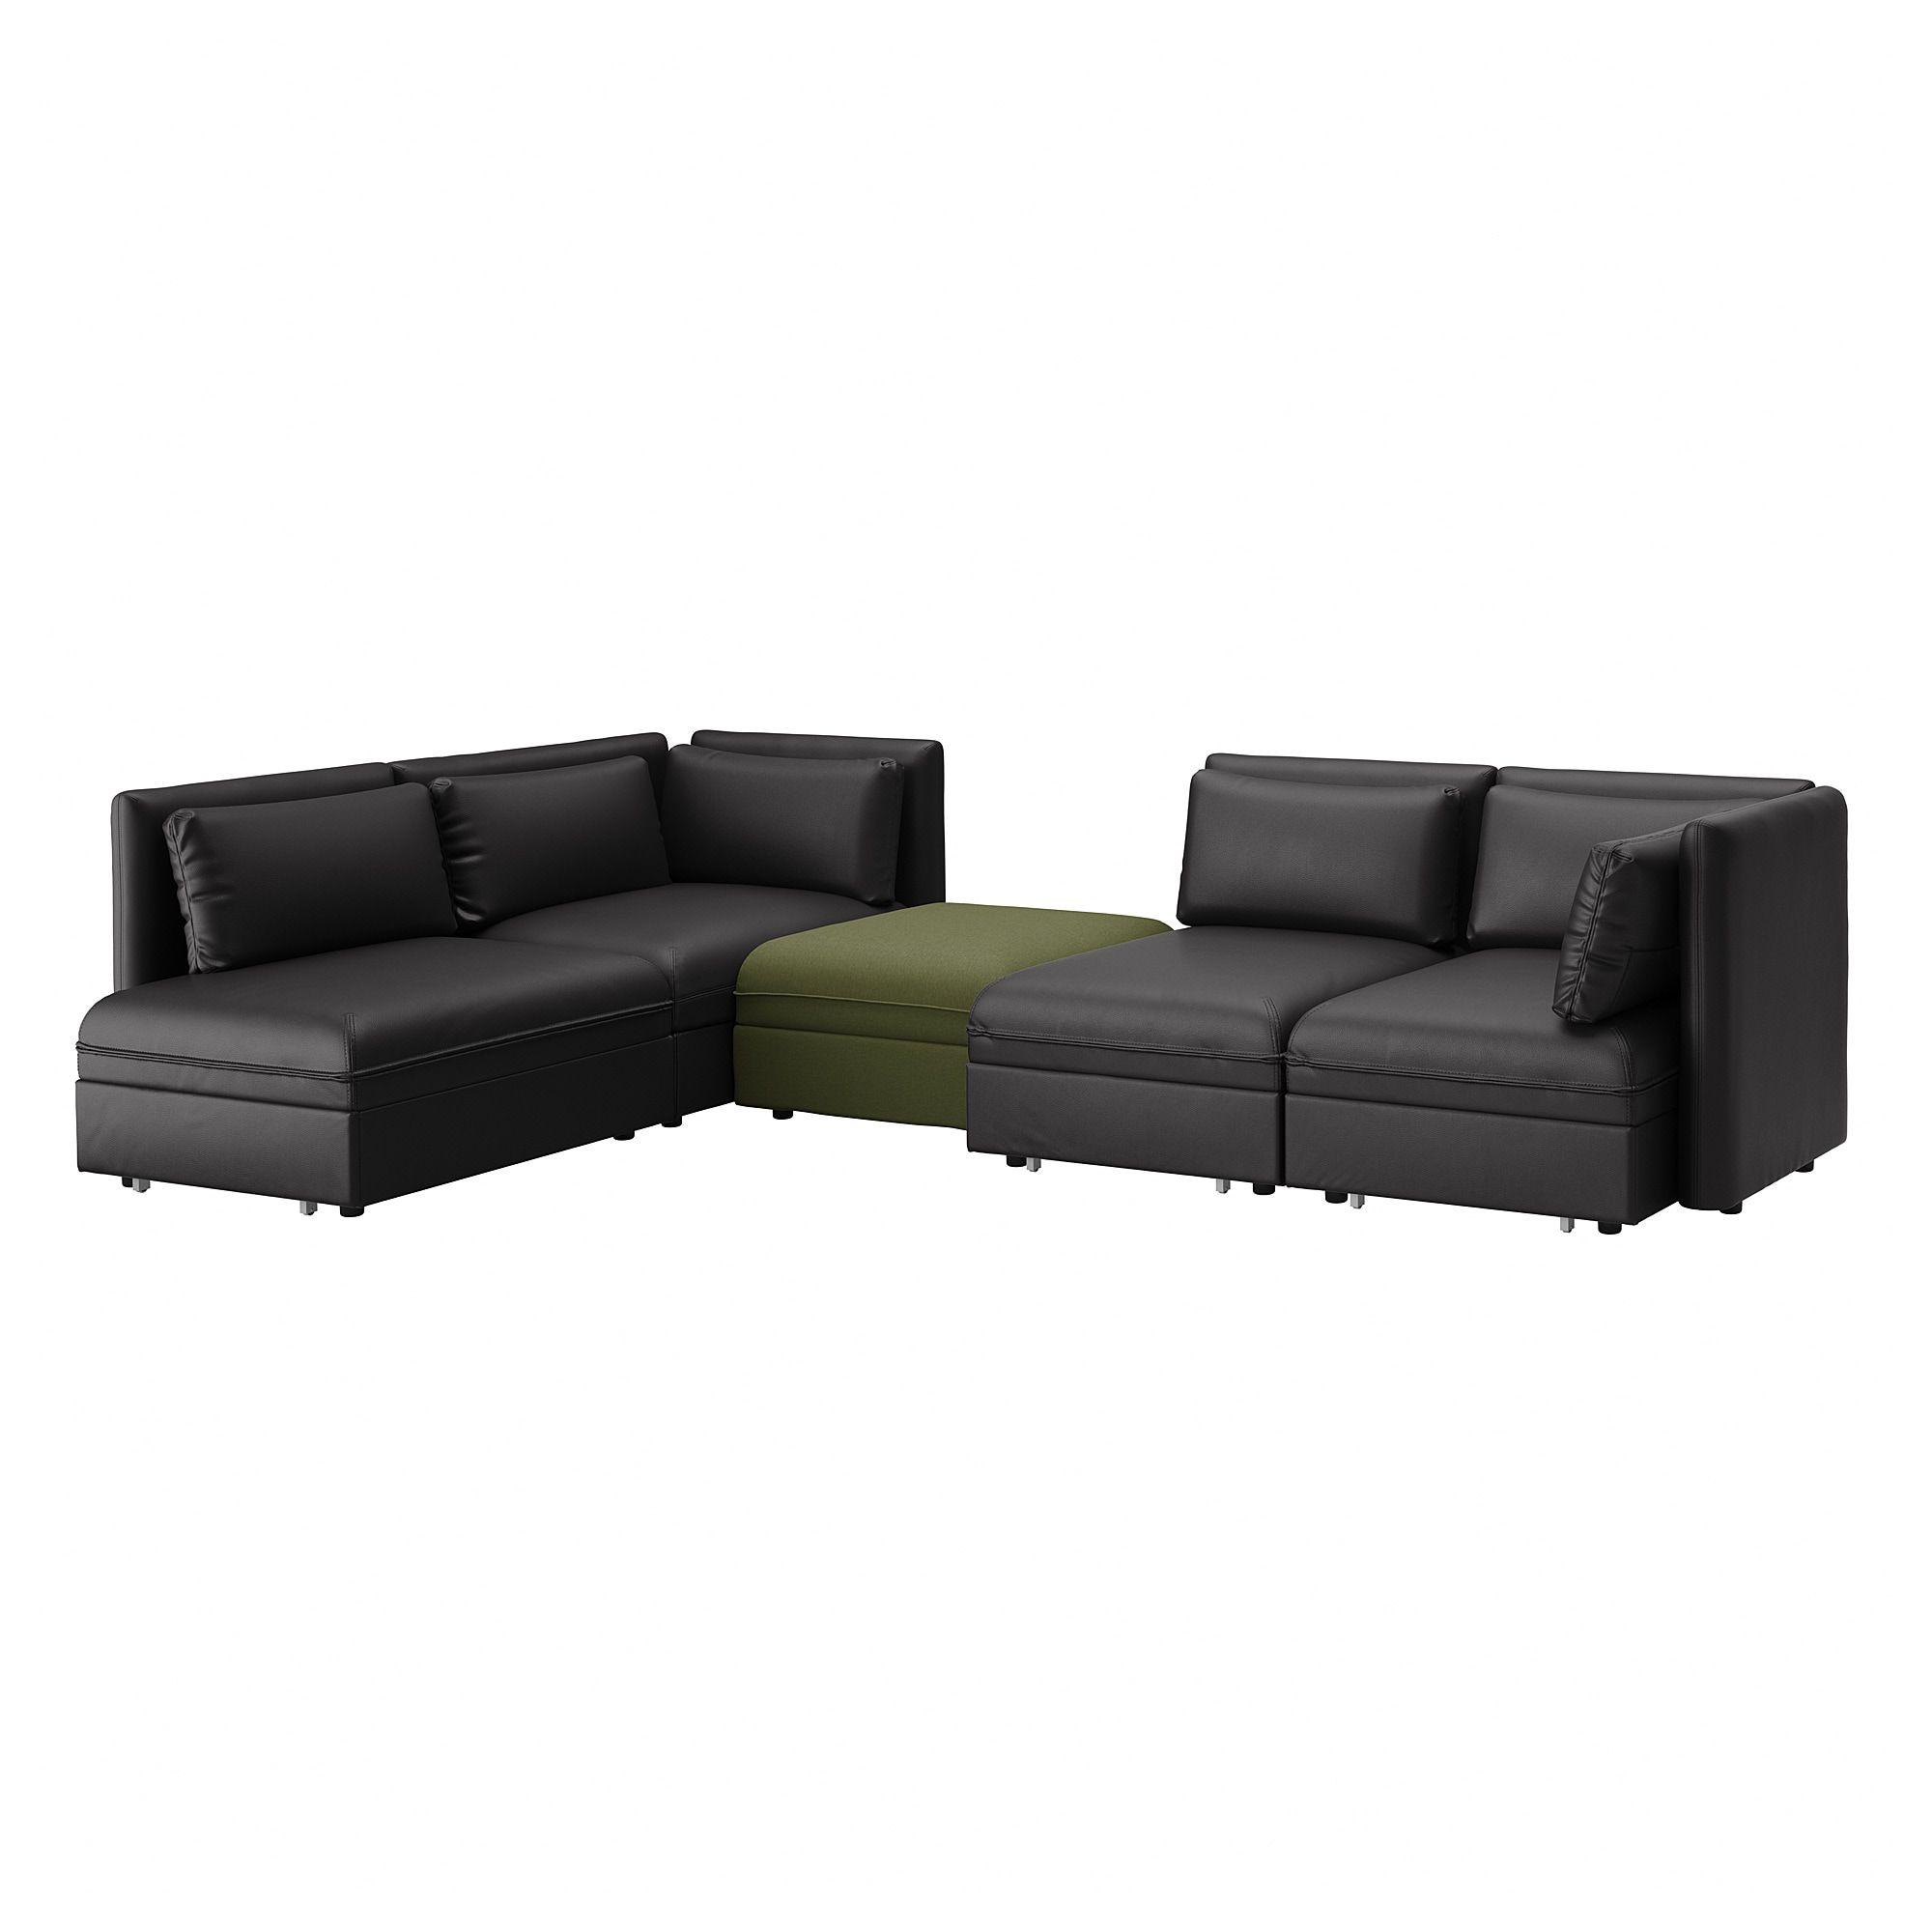 Vallentuna Mod Sofa 4 Seat W 3 Slpr Sections And Storage Murum Orrsta Black Olive Green Ikea Modular Corner Sofa Corner Sofa Corner Sofa Bed